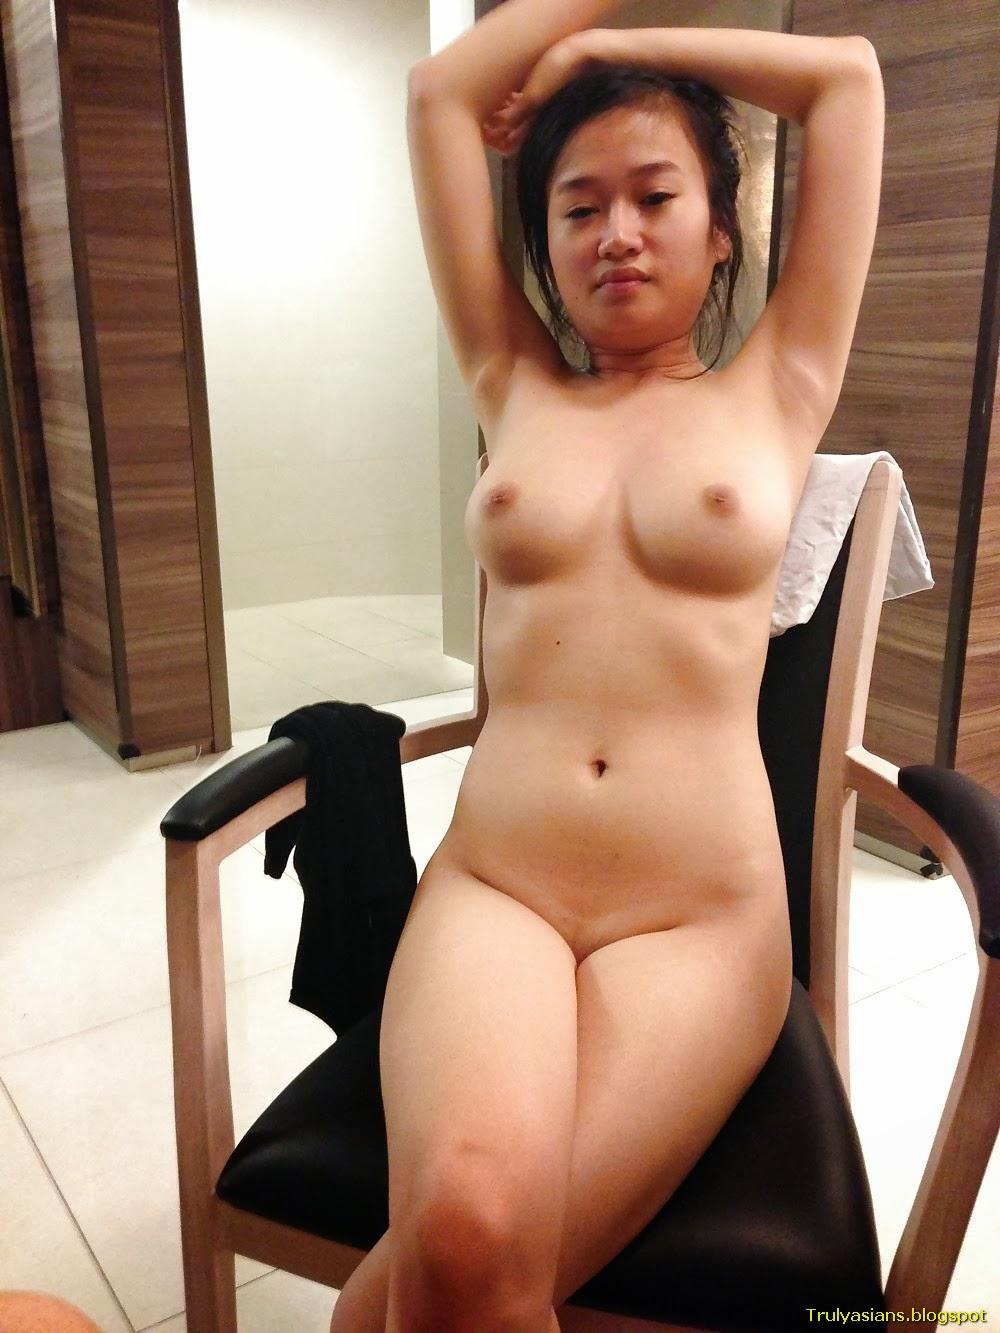 http://3.bp.blogspot.com/-ZQTOIt3bjik/UpZ_5fdFBRI/AAAAAAAANyo/NTqGvg31v0A/s1600/trulyasians.blogspot+-+Taiwan+GF+Wild+Sex+in+Singapore+032+.jpg